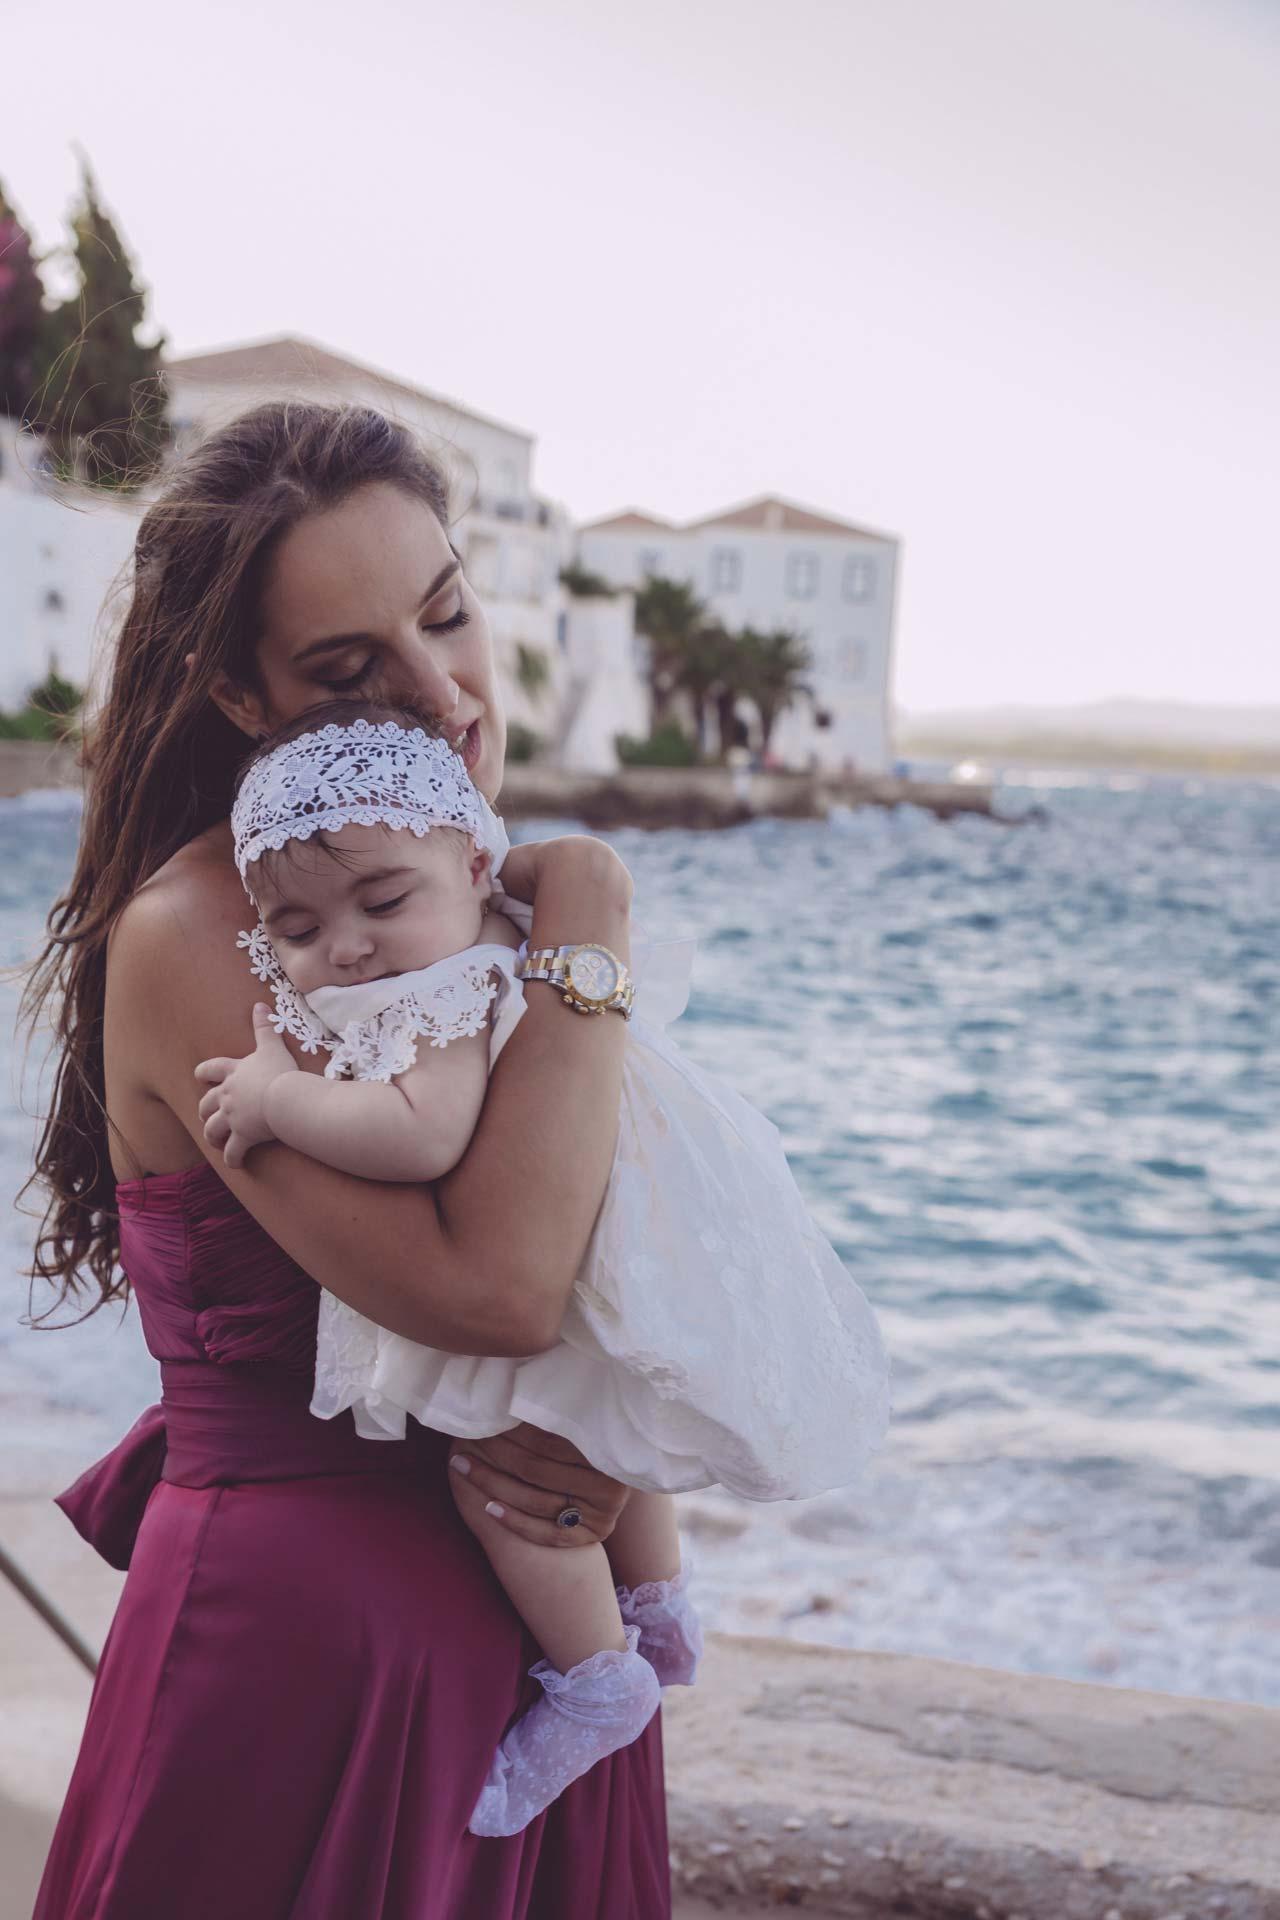 579 PhotoVaptisis βαπτιση σπετσεσ φωτογραφοσ vaptisi koritsi agios nikolaos spestes island photographer thalassa fotografisi goneis